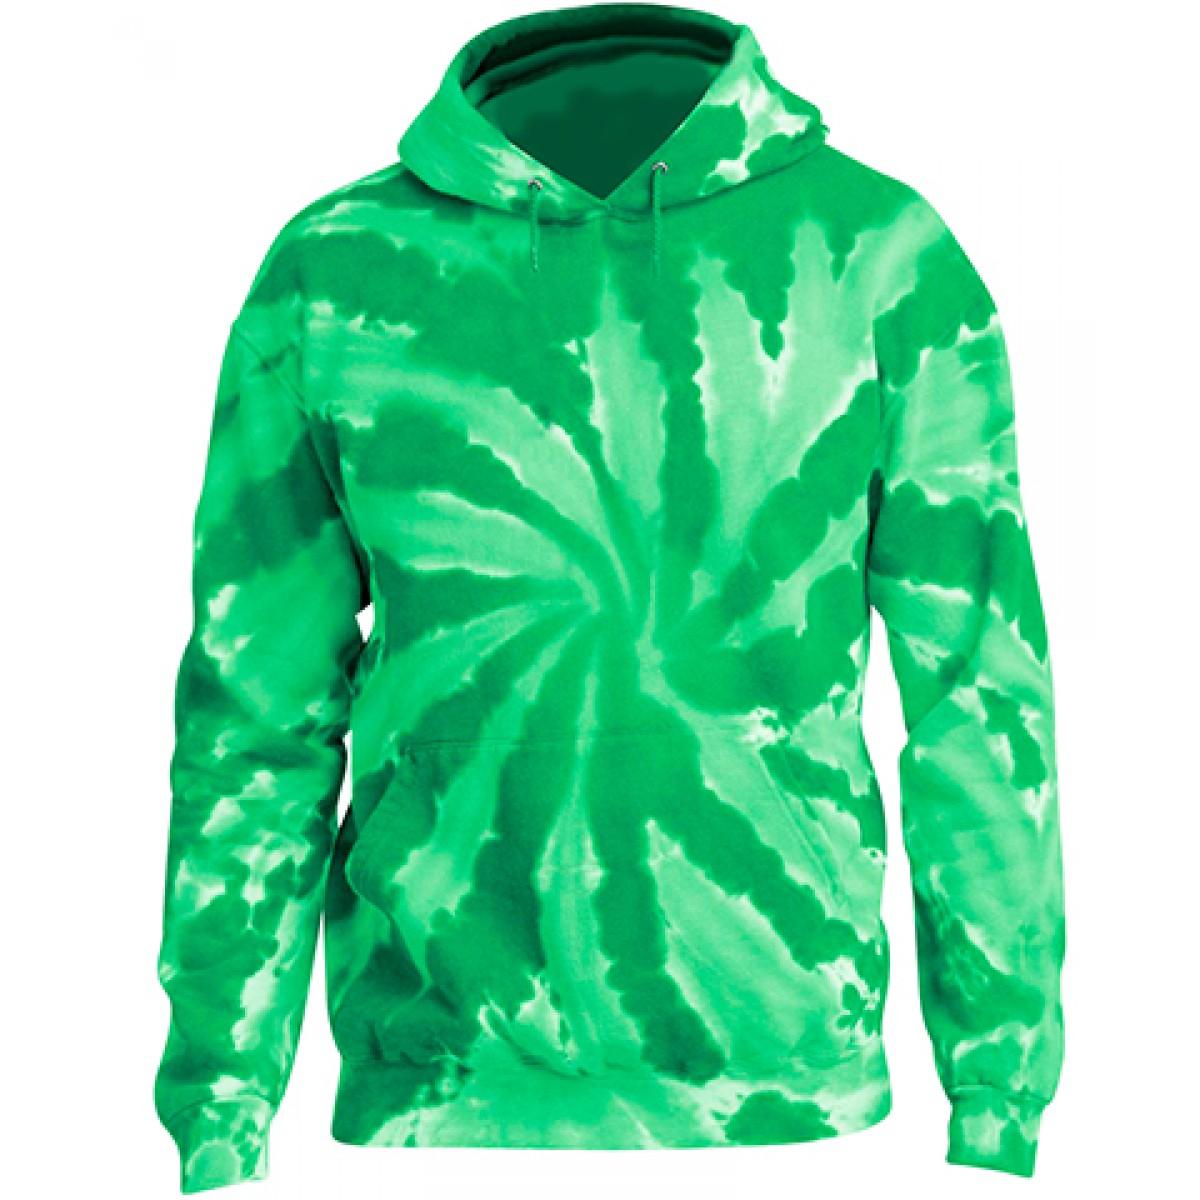 Tie-Dye Pullover Hooded Sweatshirt-Green-M